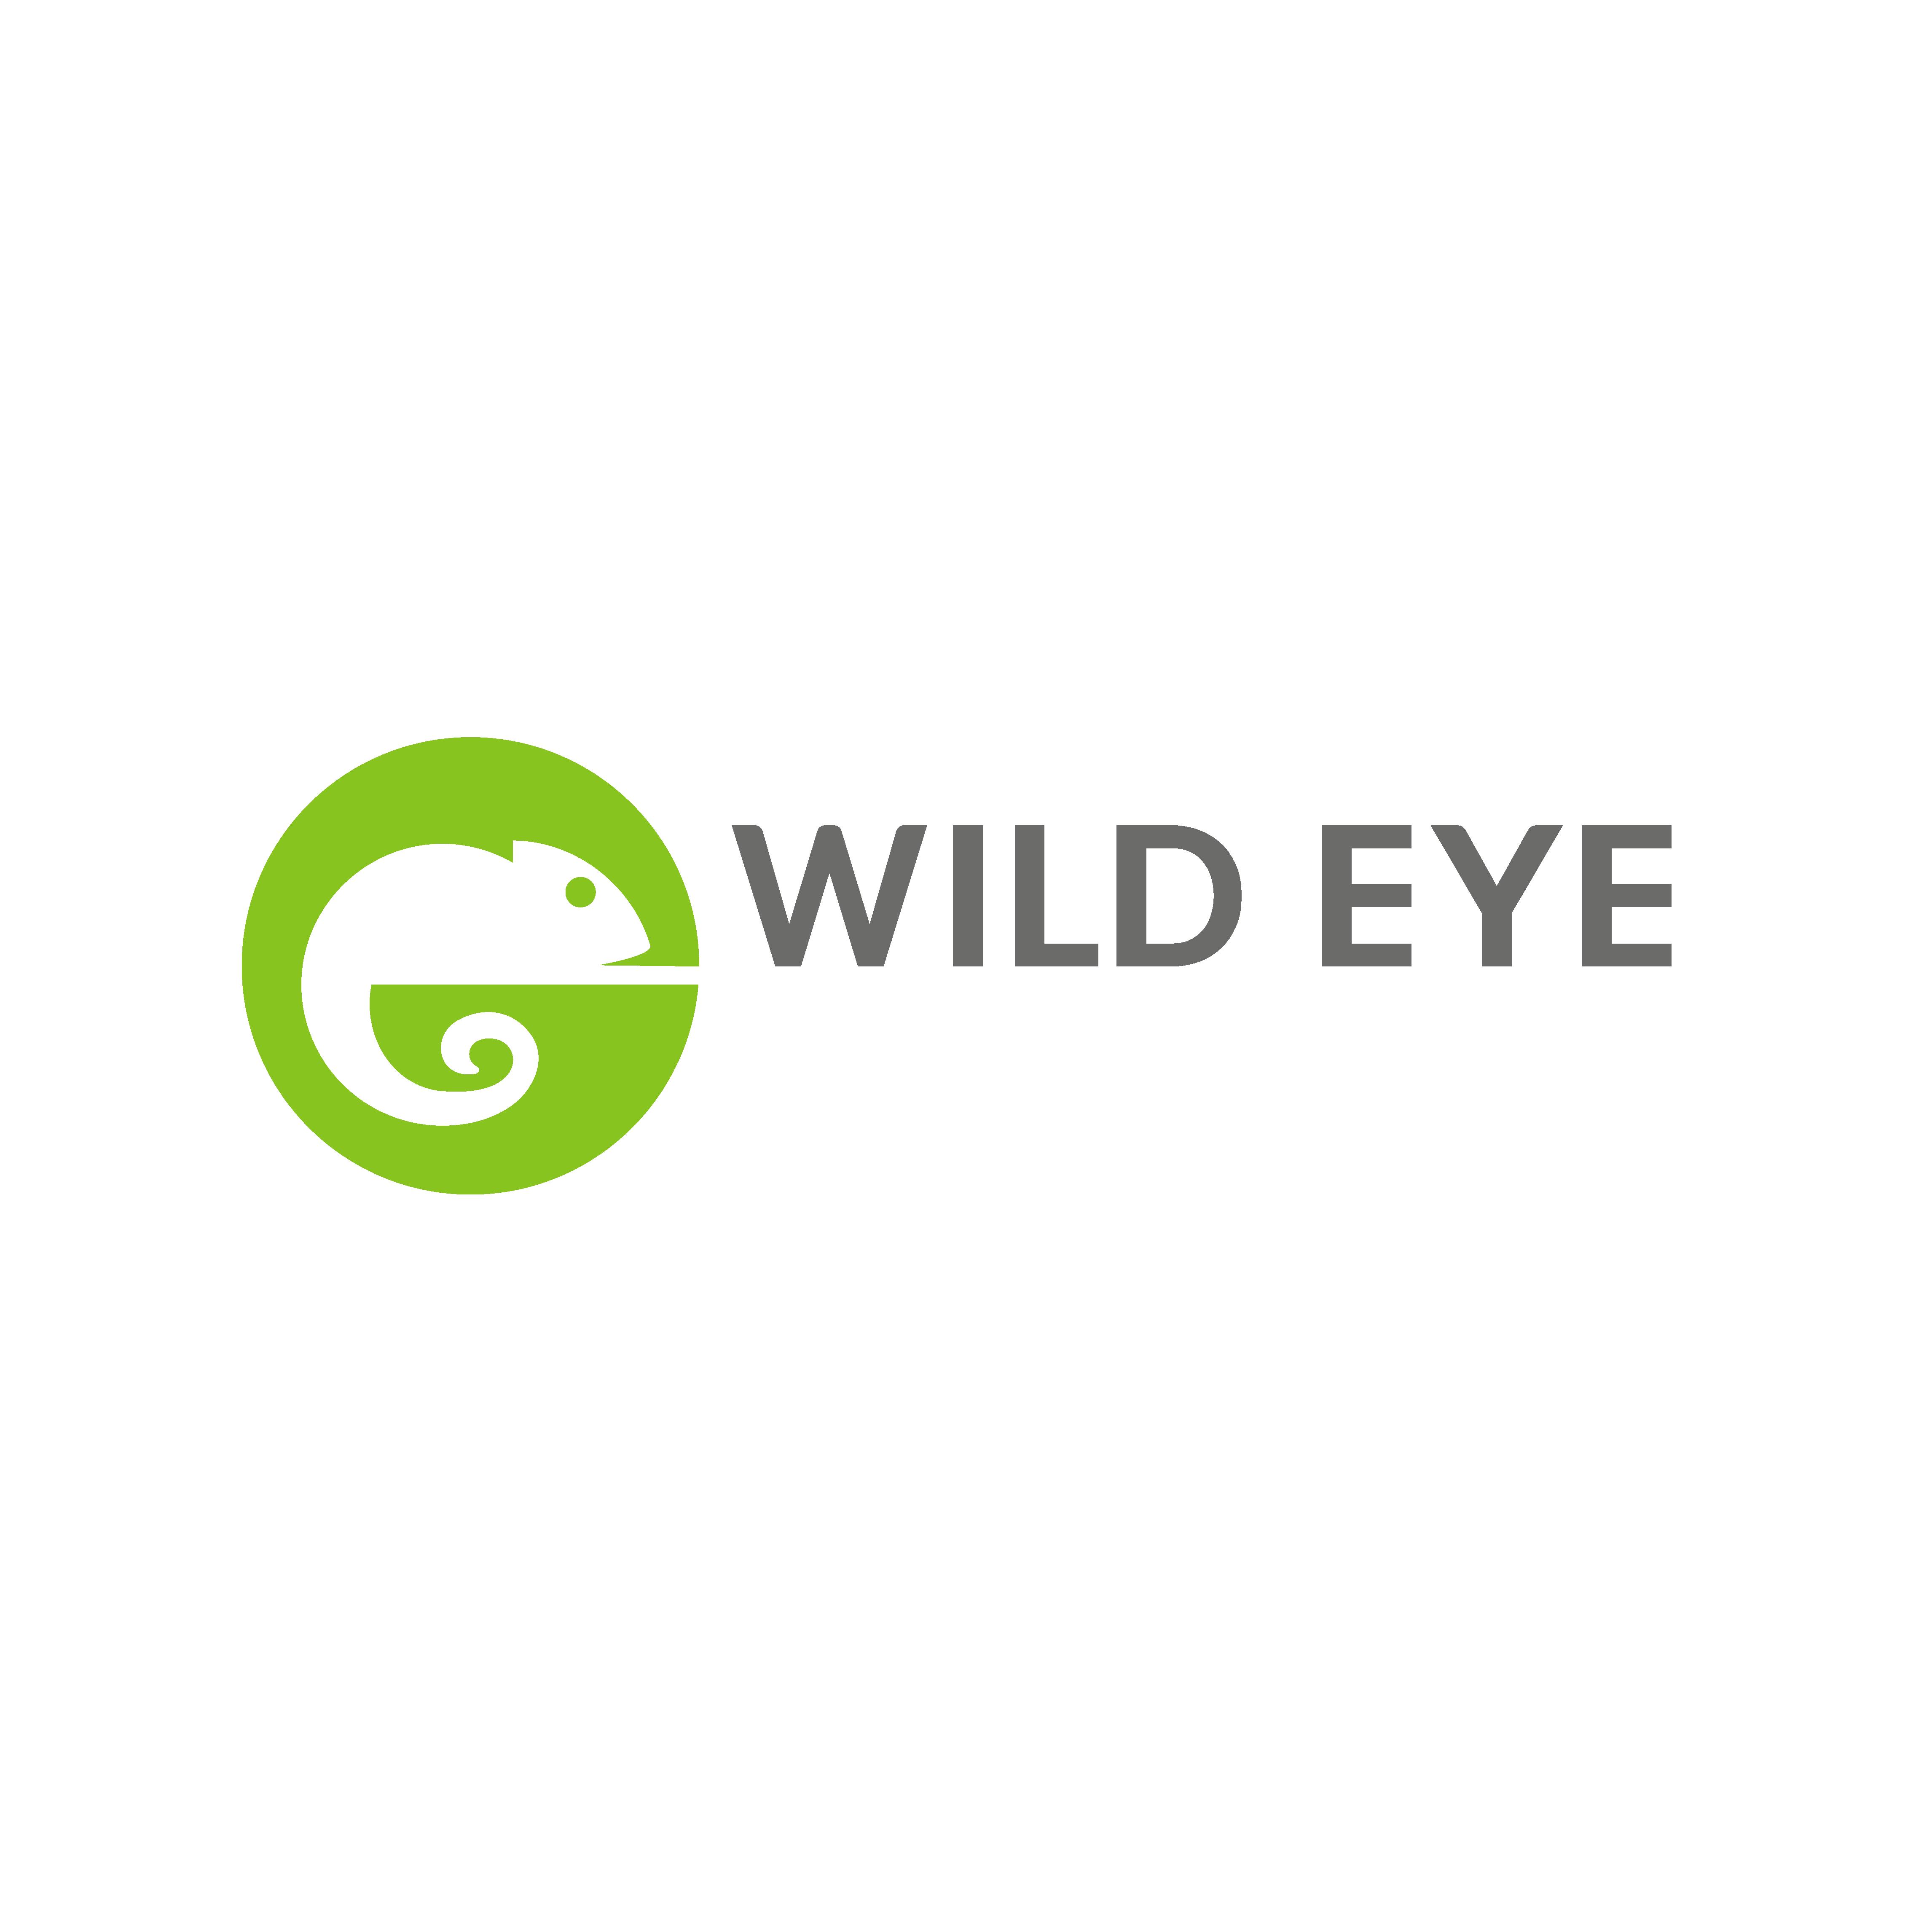 WILD EYE_Logo-export-RGB_ALL_v2_Artboard 5